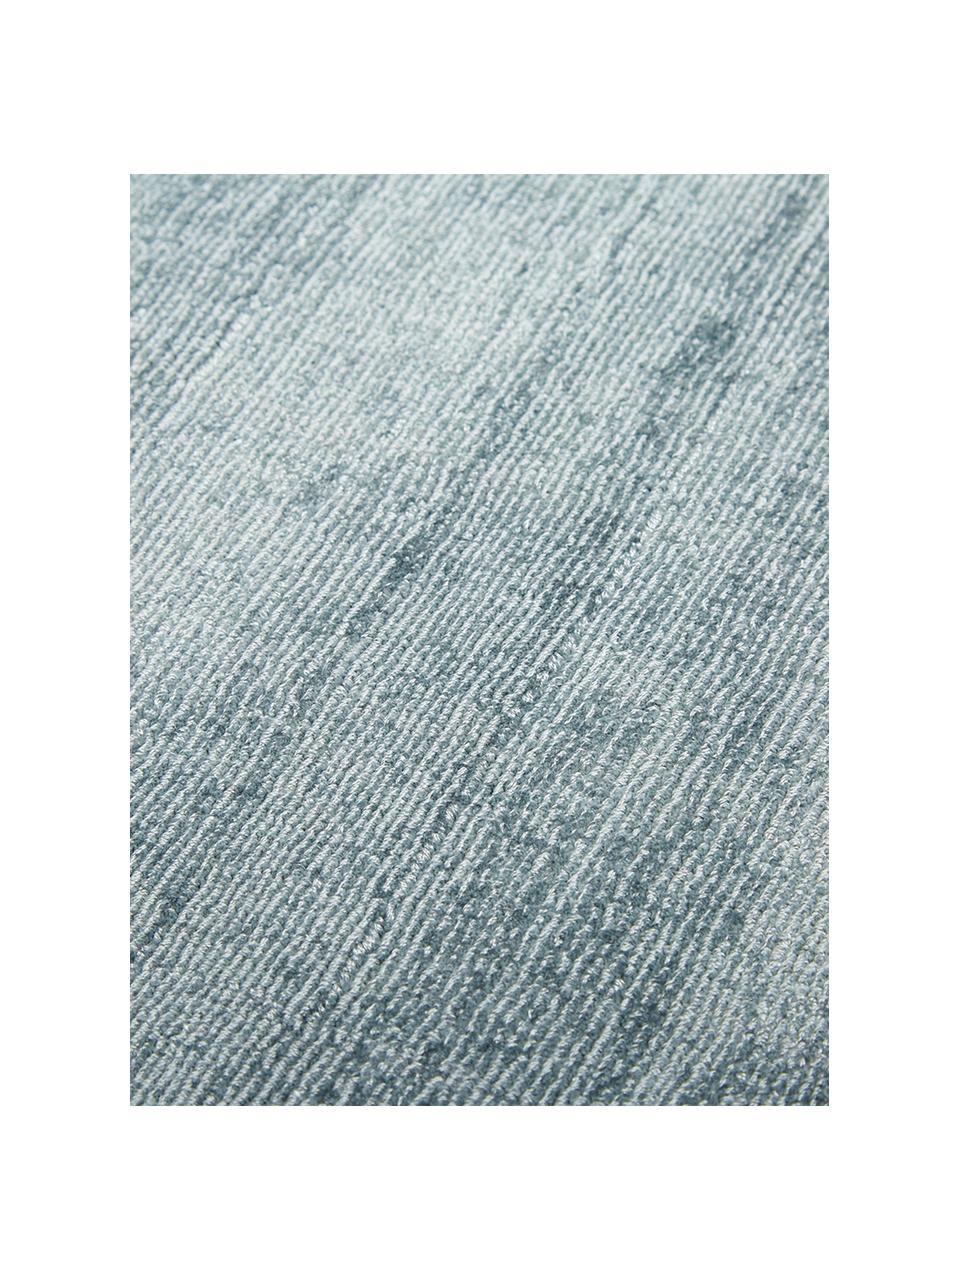 Handgewebter Viskoseteppich Jane in Eisblau, Flor: 100% Viskose, Eisblau, B 200 x L 300 cm (Grösse L)